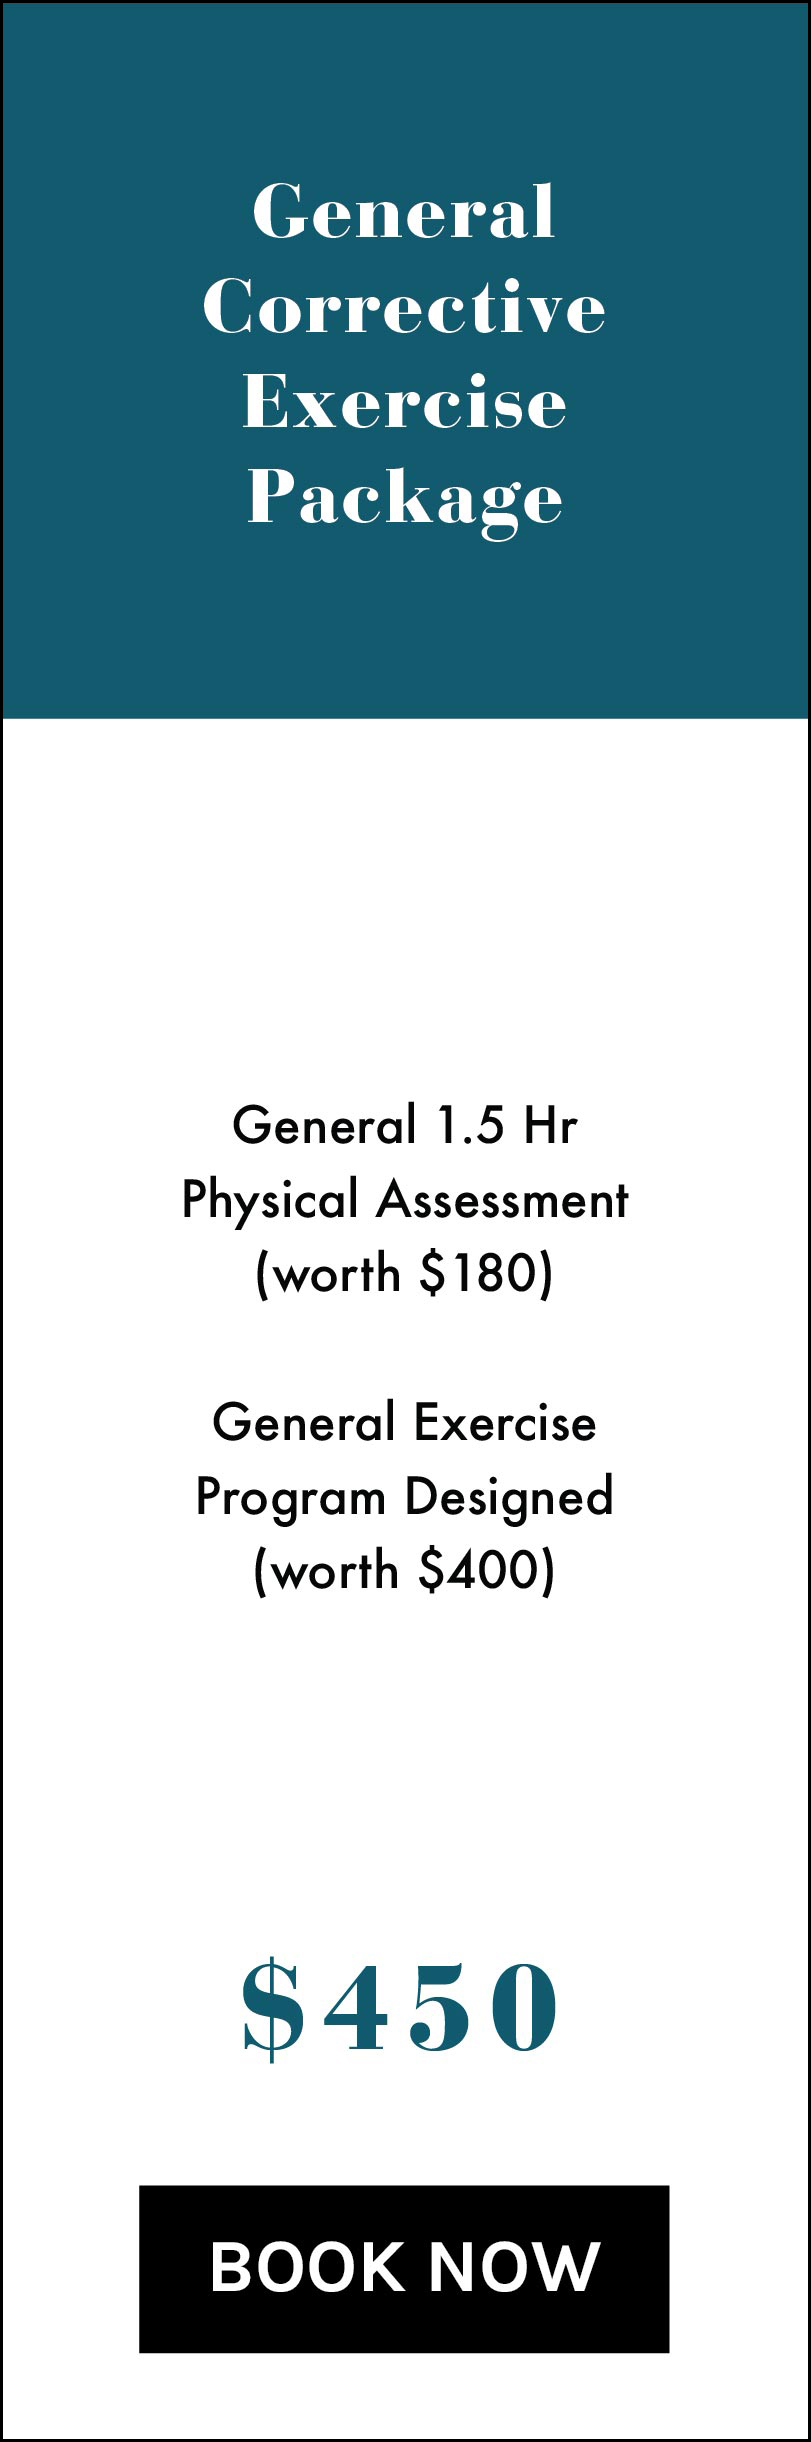 rhythm-health-package-graphic1-01.jpg